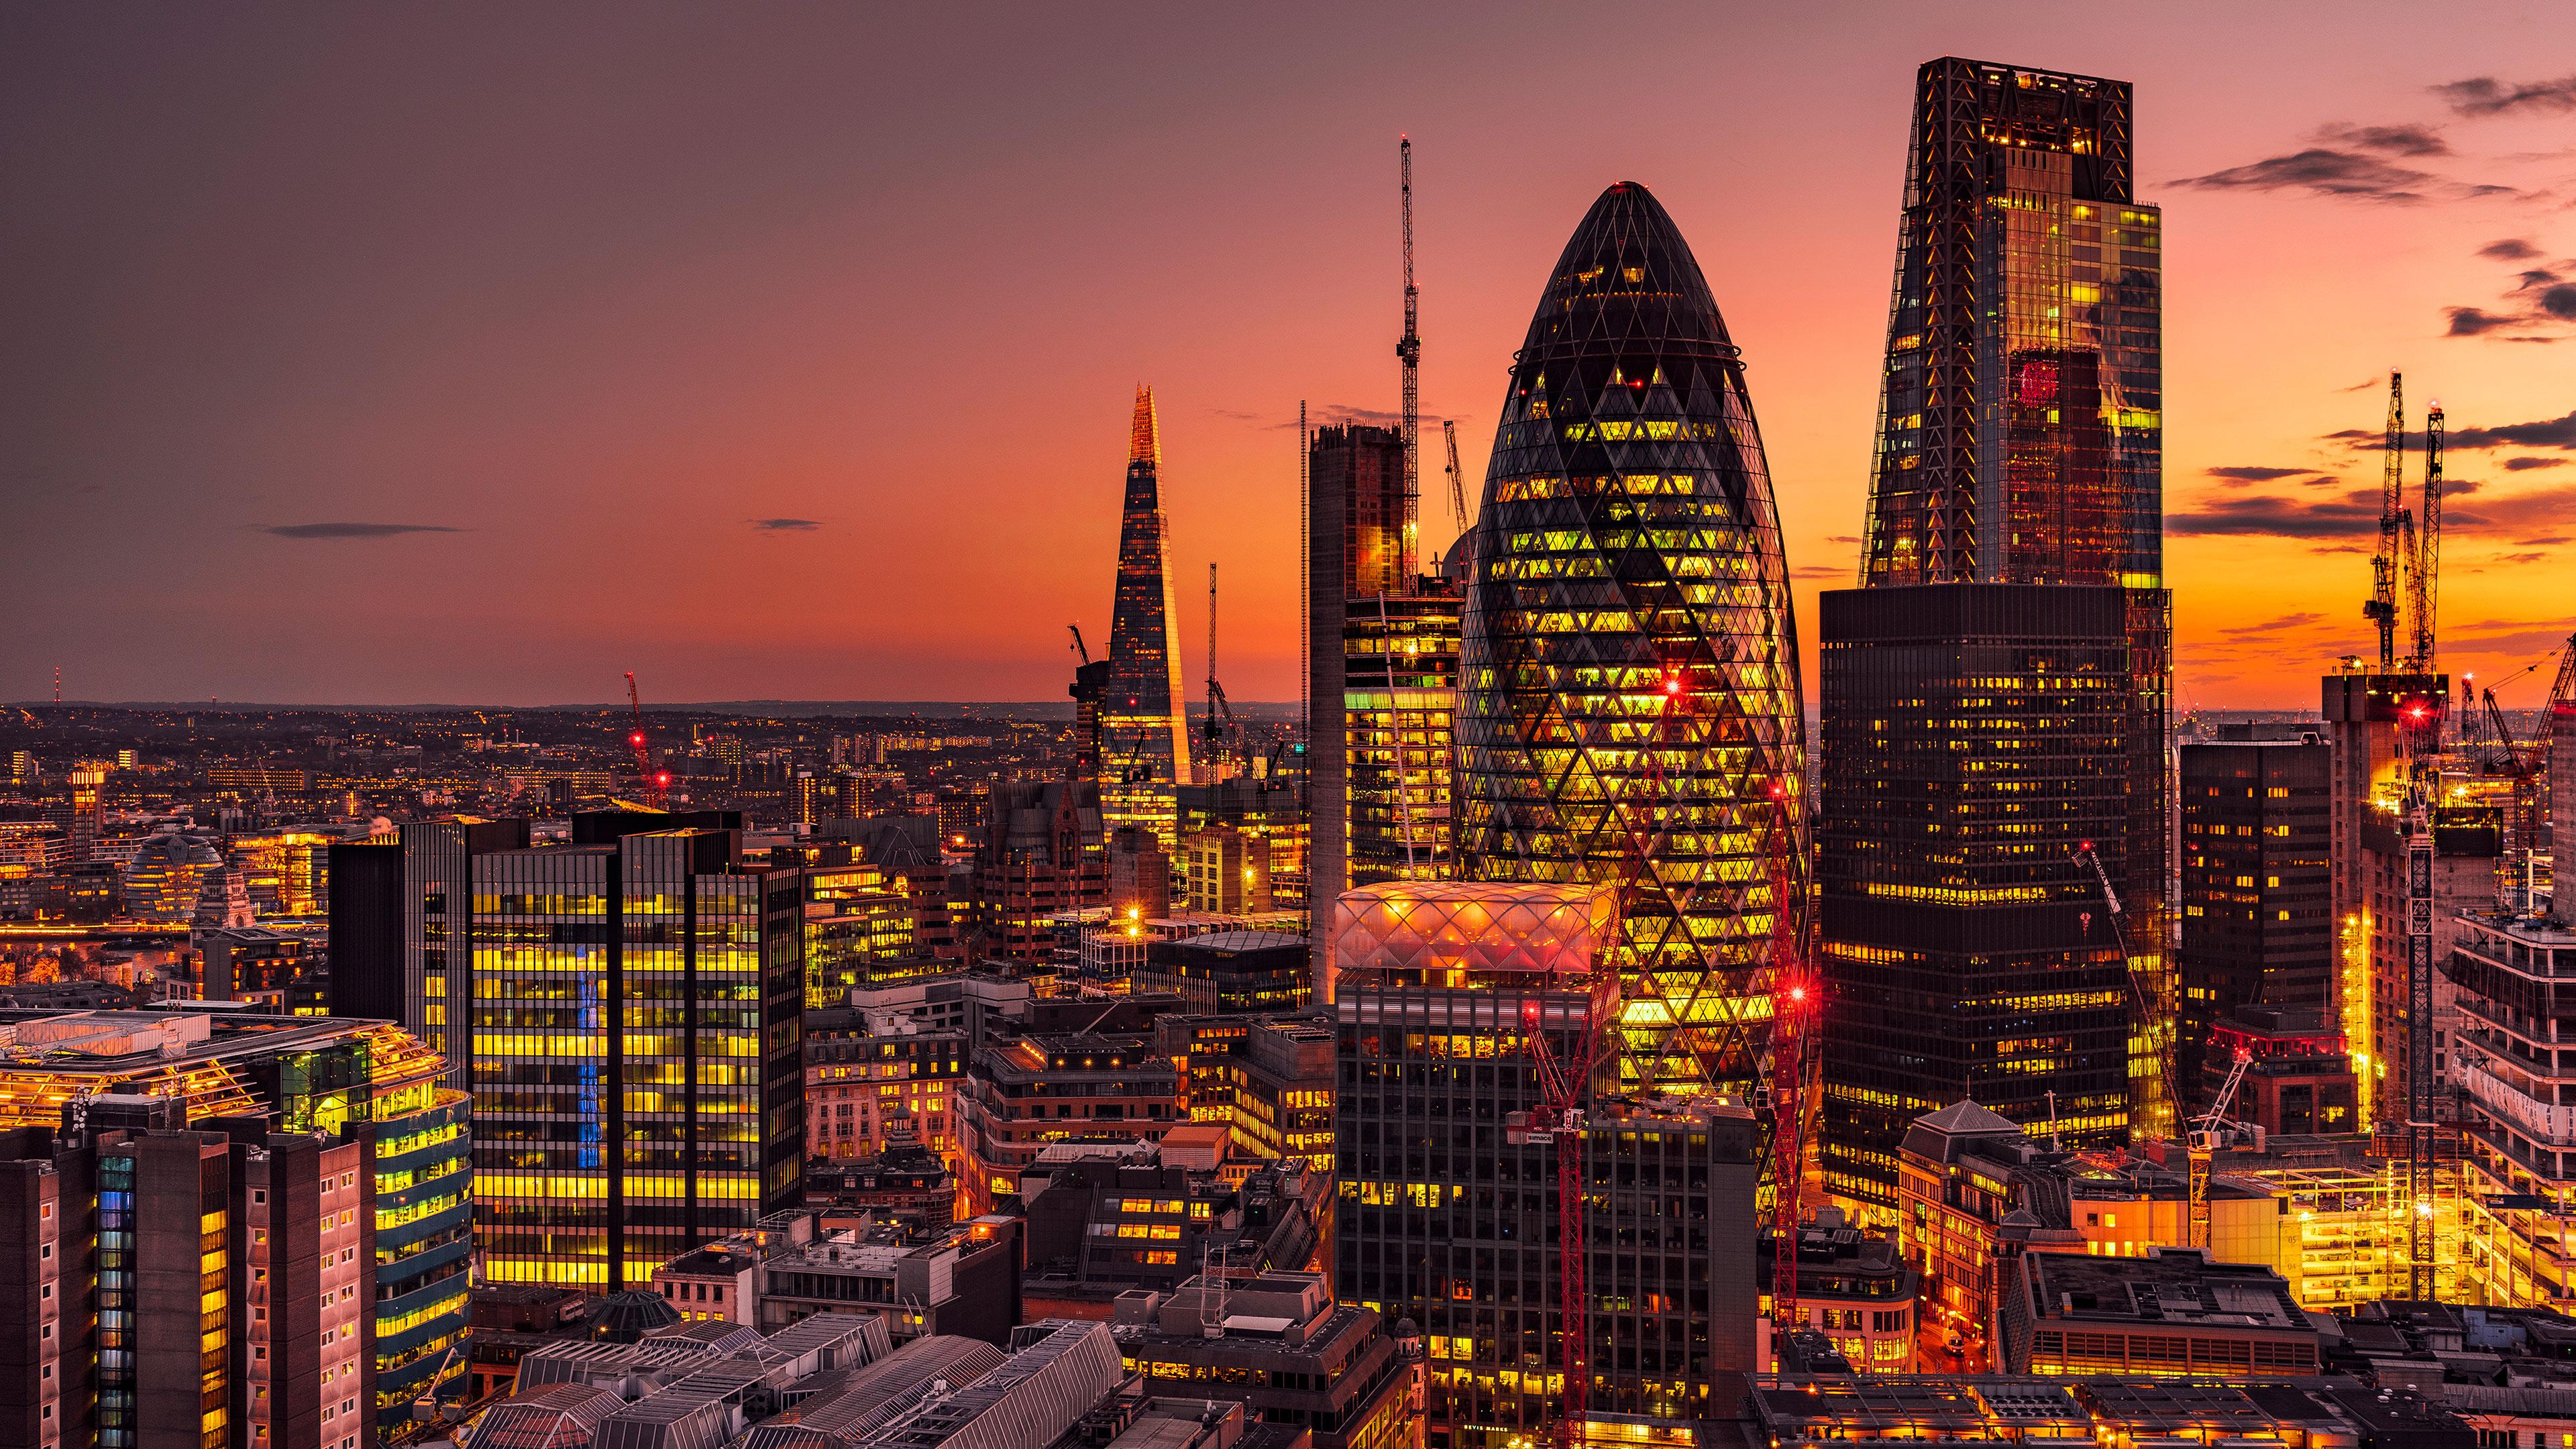 london lights 4k 1538069230 - London Lights 4k - world wallpapers, photography wallpapers, night wallpapers, london wallpapers, lights wallpapers, hd-wallpapers, 4k-wallpapers